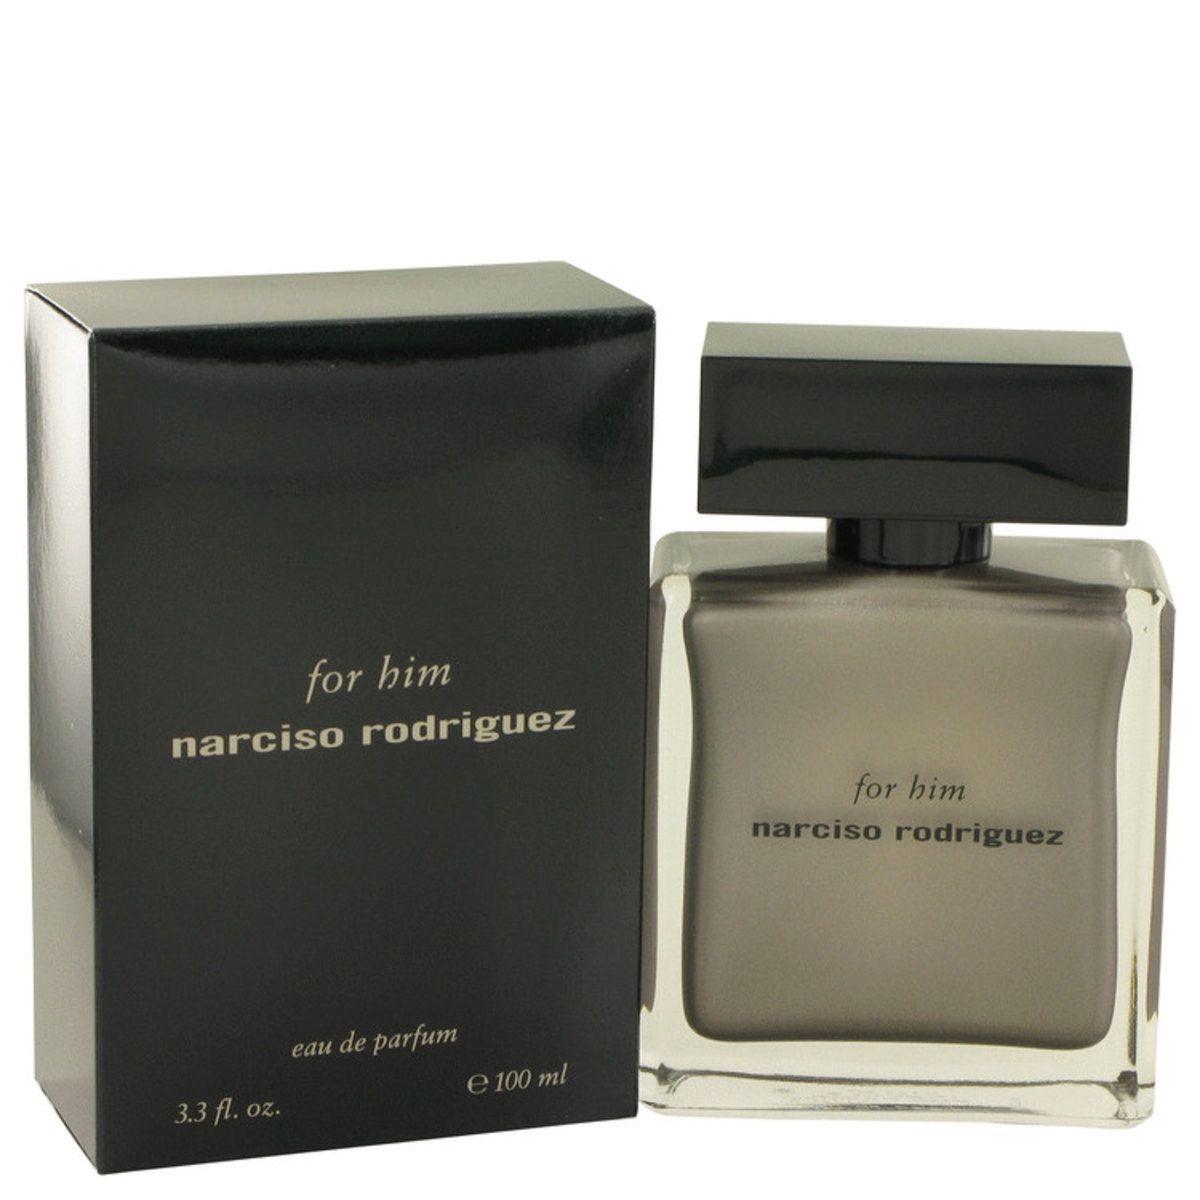 Narciso Rodriguez for Him Eau de Parfum Masculino